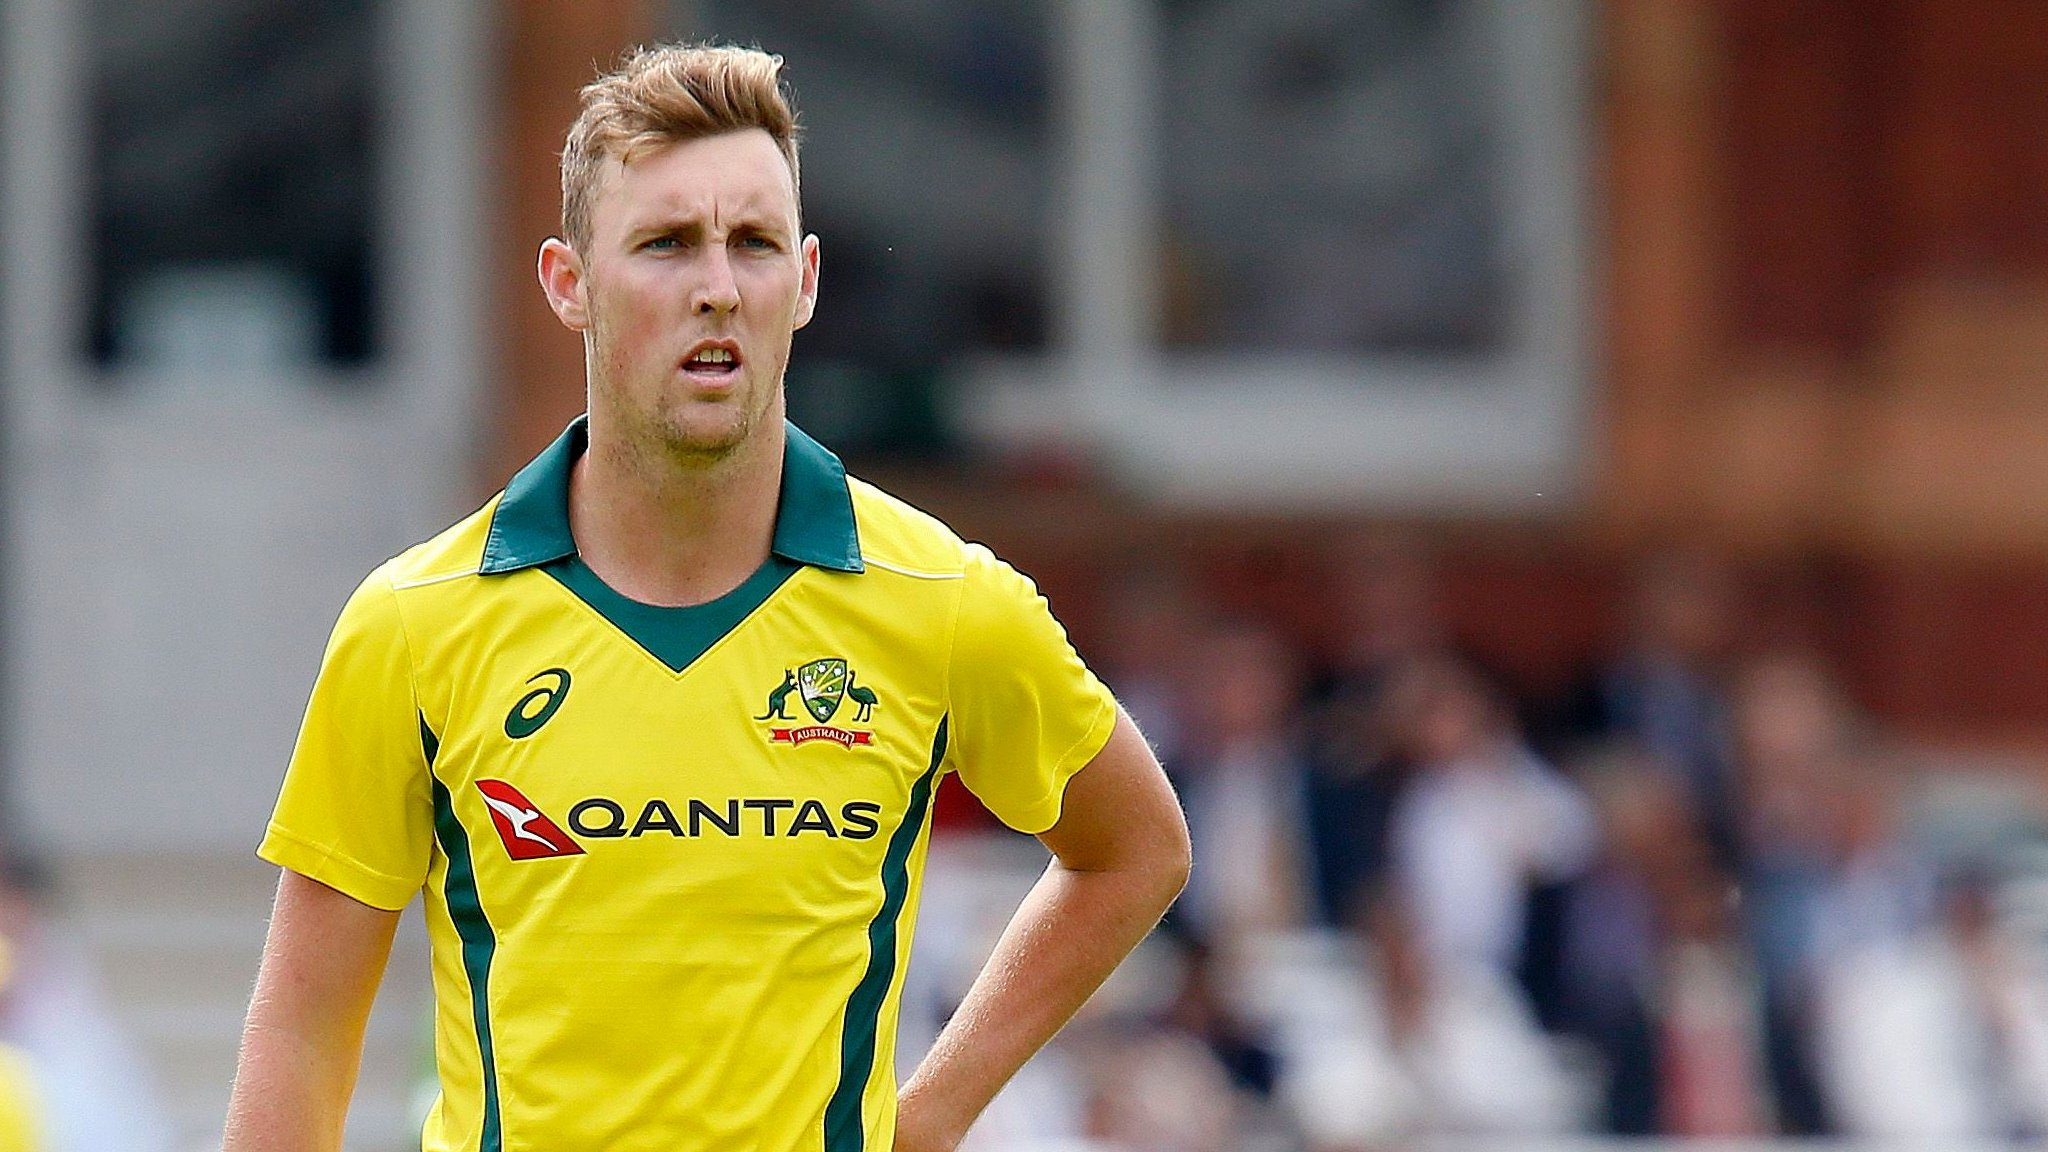 Derbyshire sign Australia pace bowler Stanlake